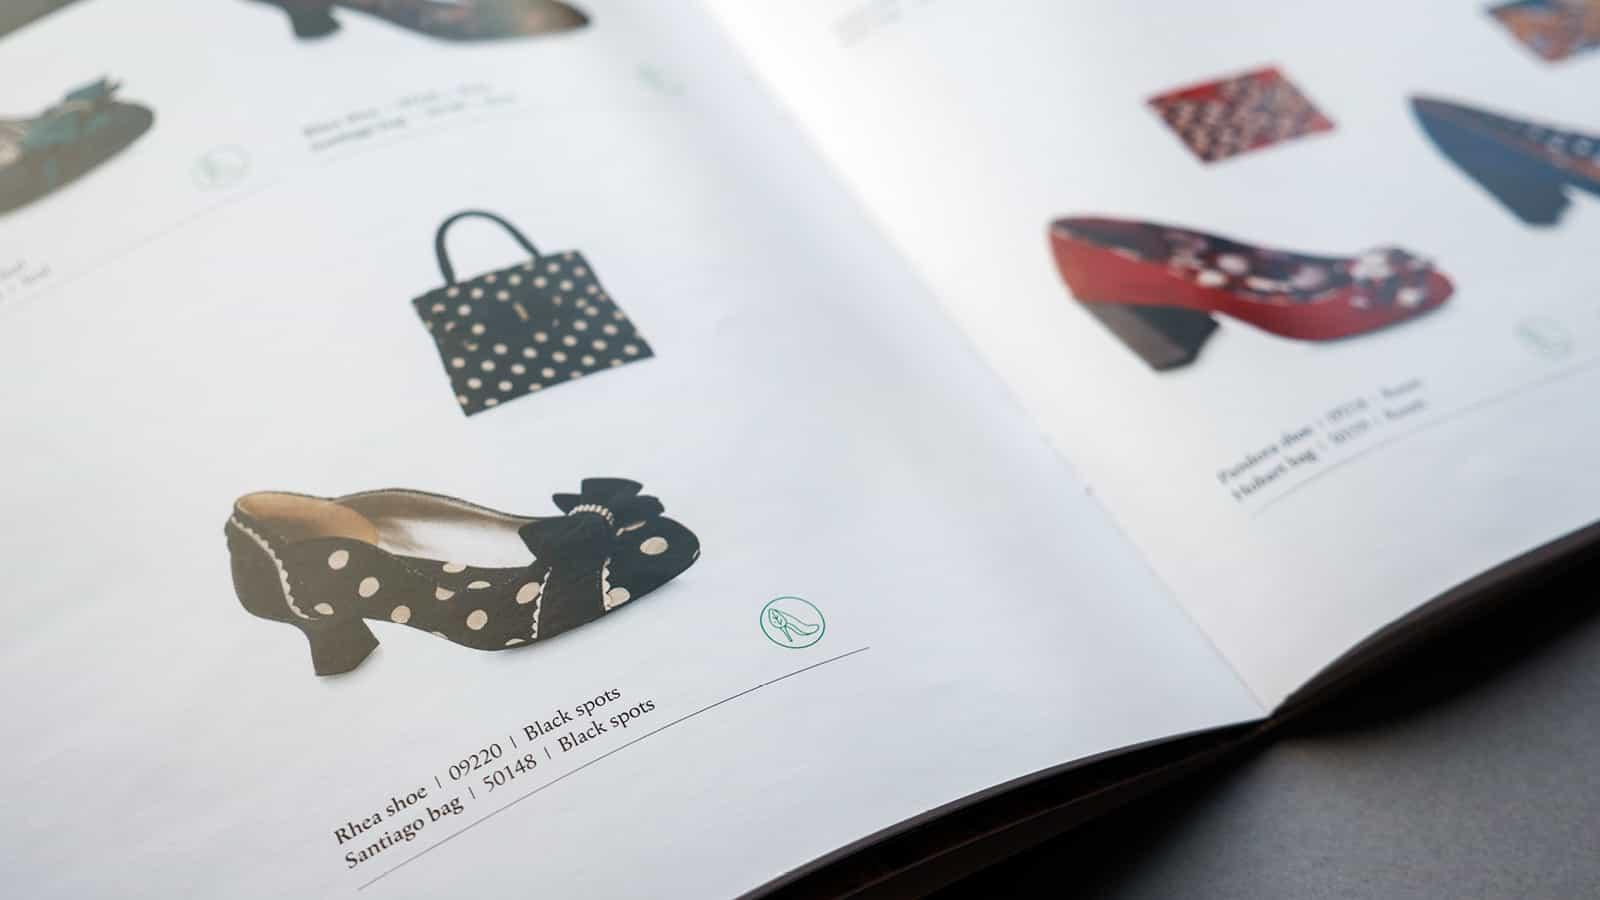 footwear-shoe-fashion-branding-look-book-marketing-design-milton-keynes-7